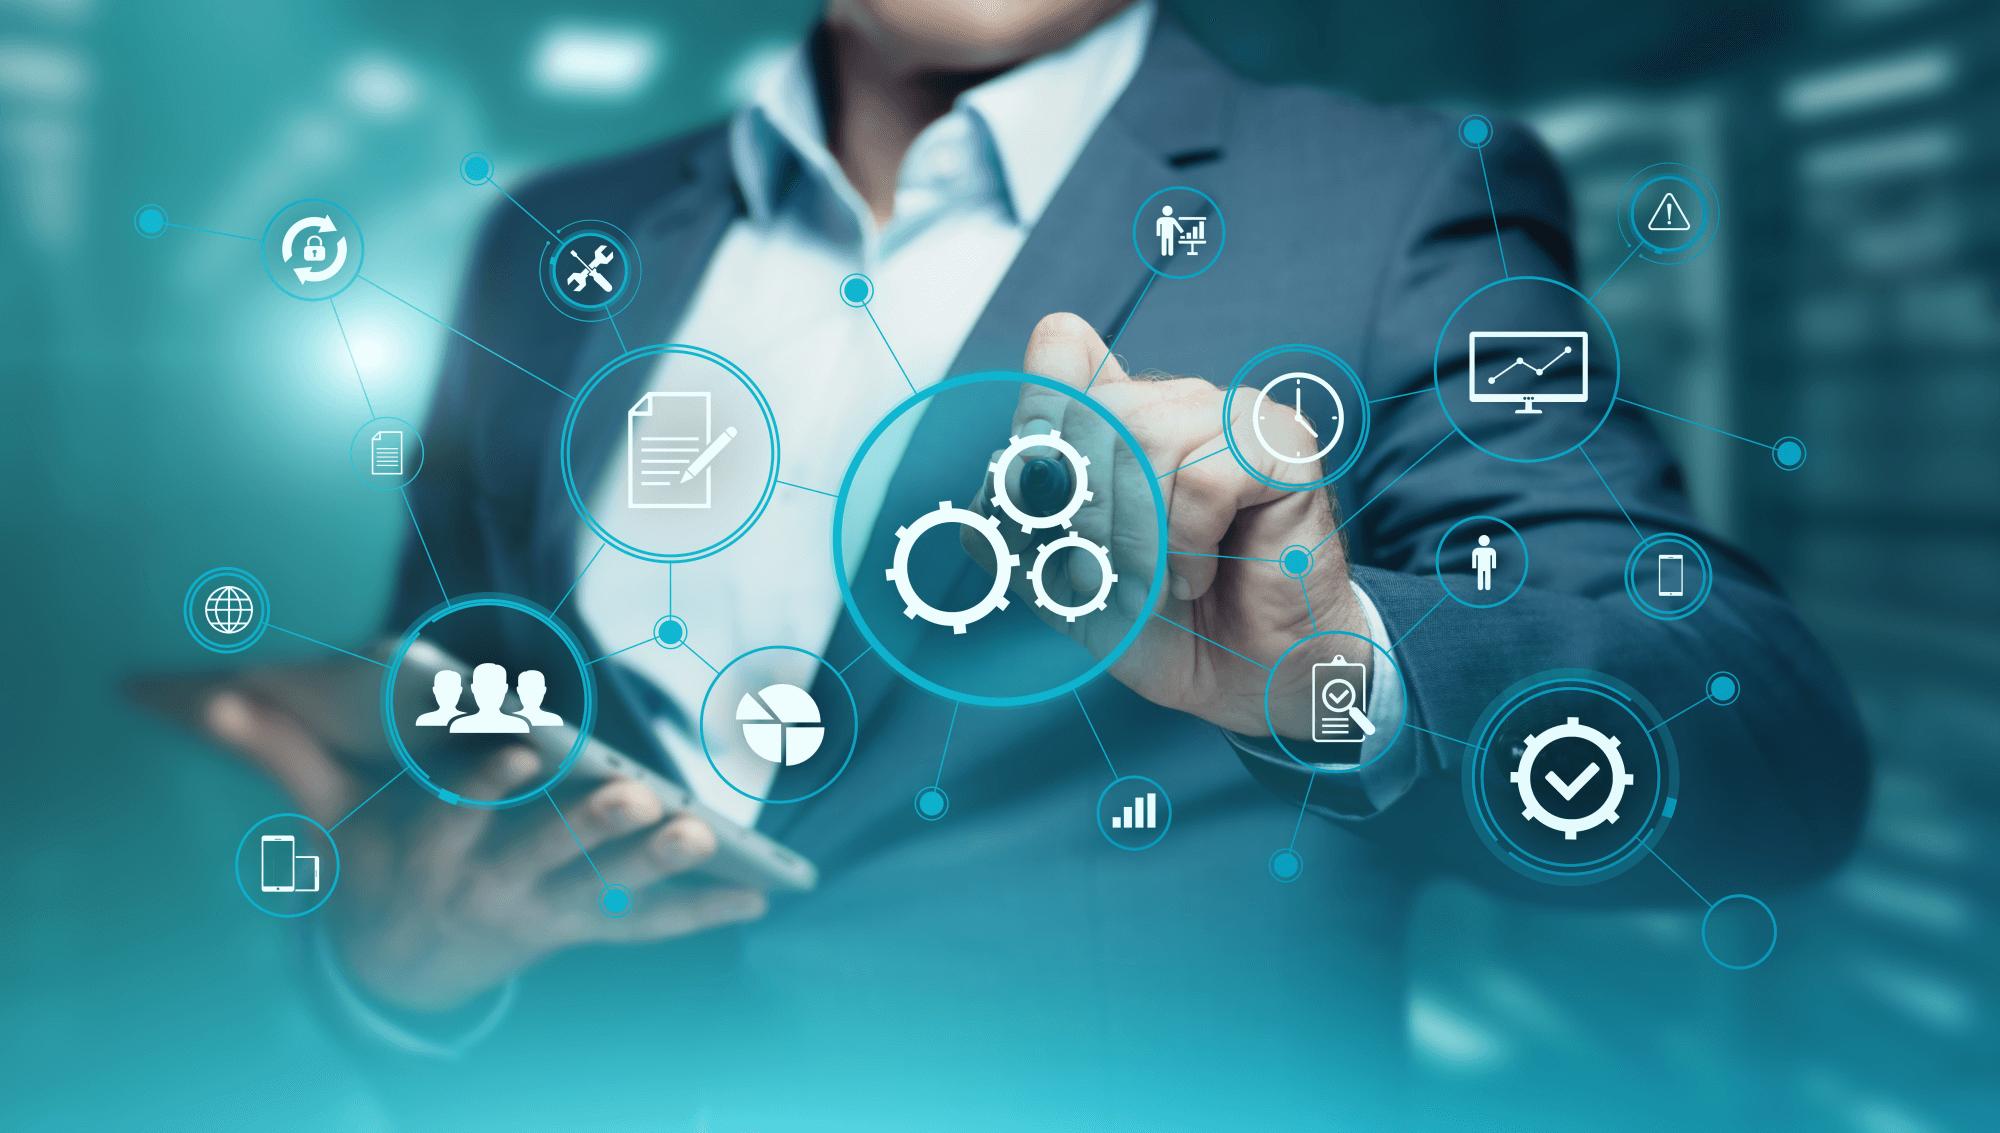 The ethics of AI and big data | 5 ethical principles | Responsible AI